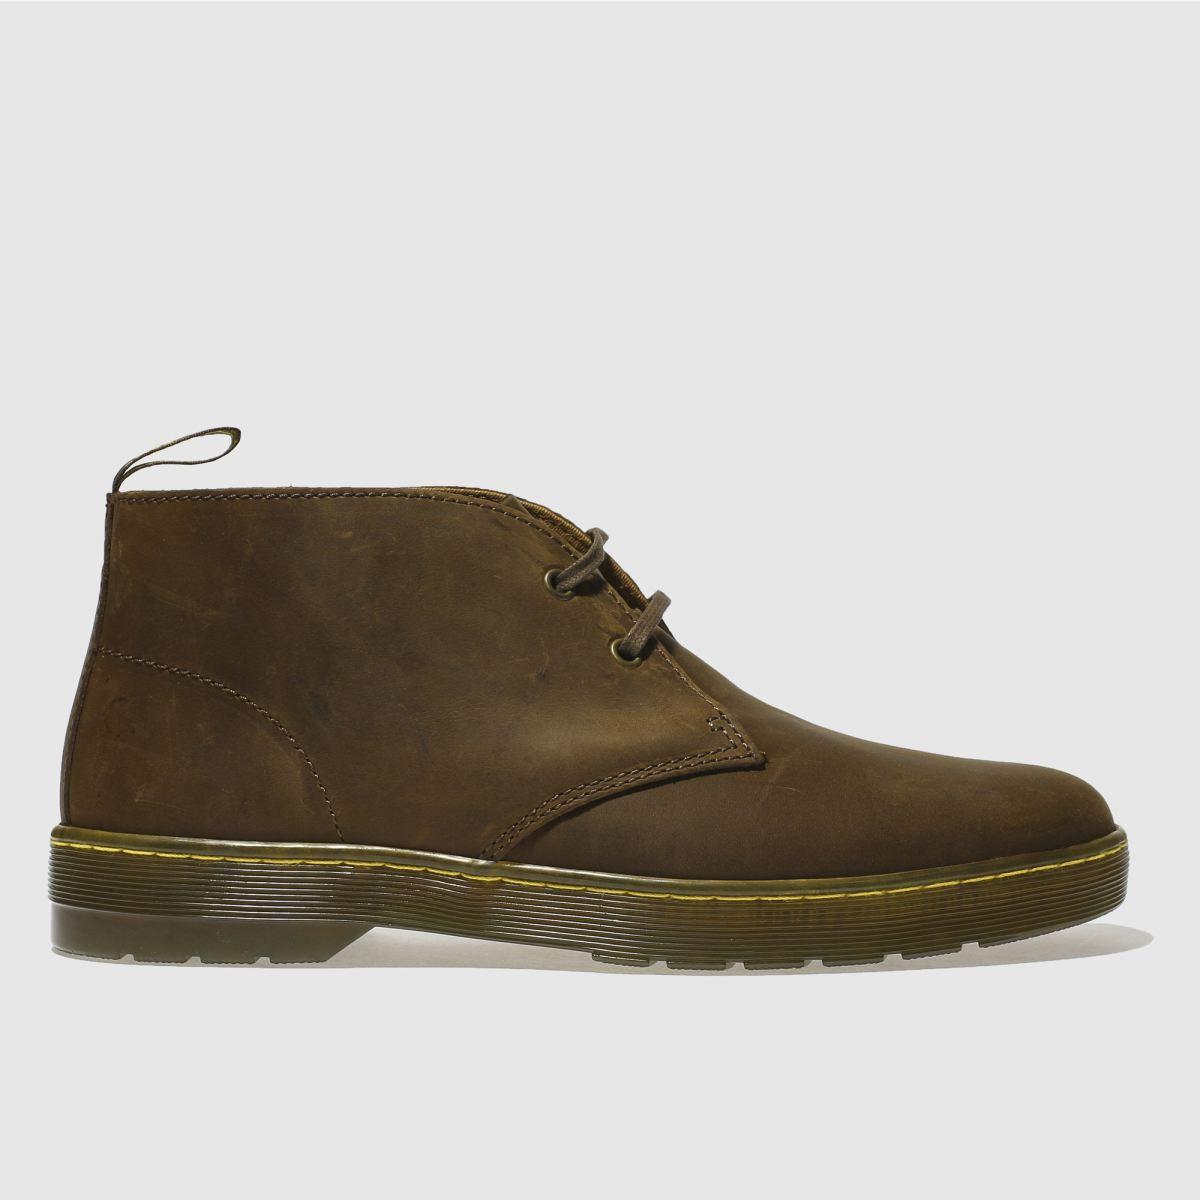 Dr Martens Brown Cabrillo Boots